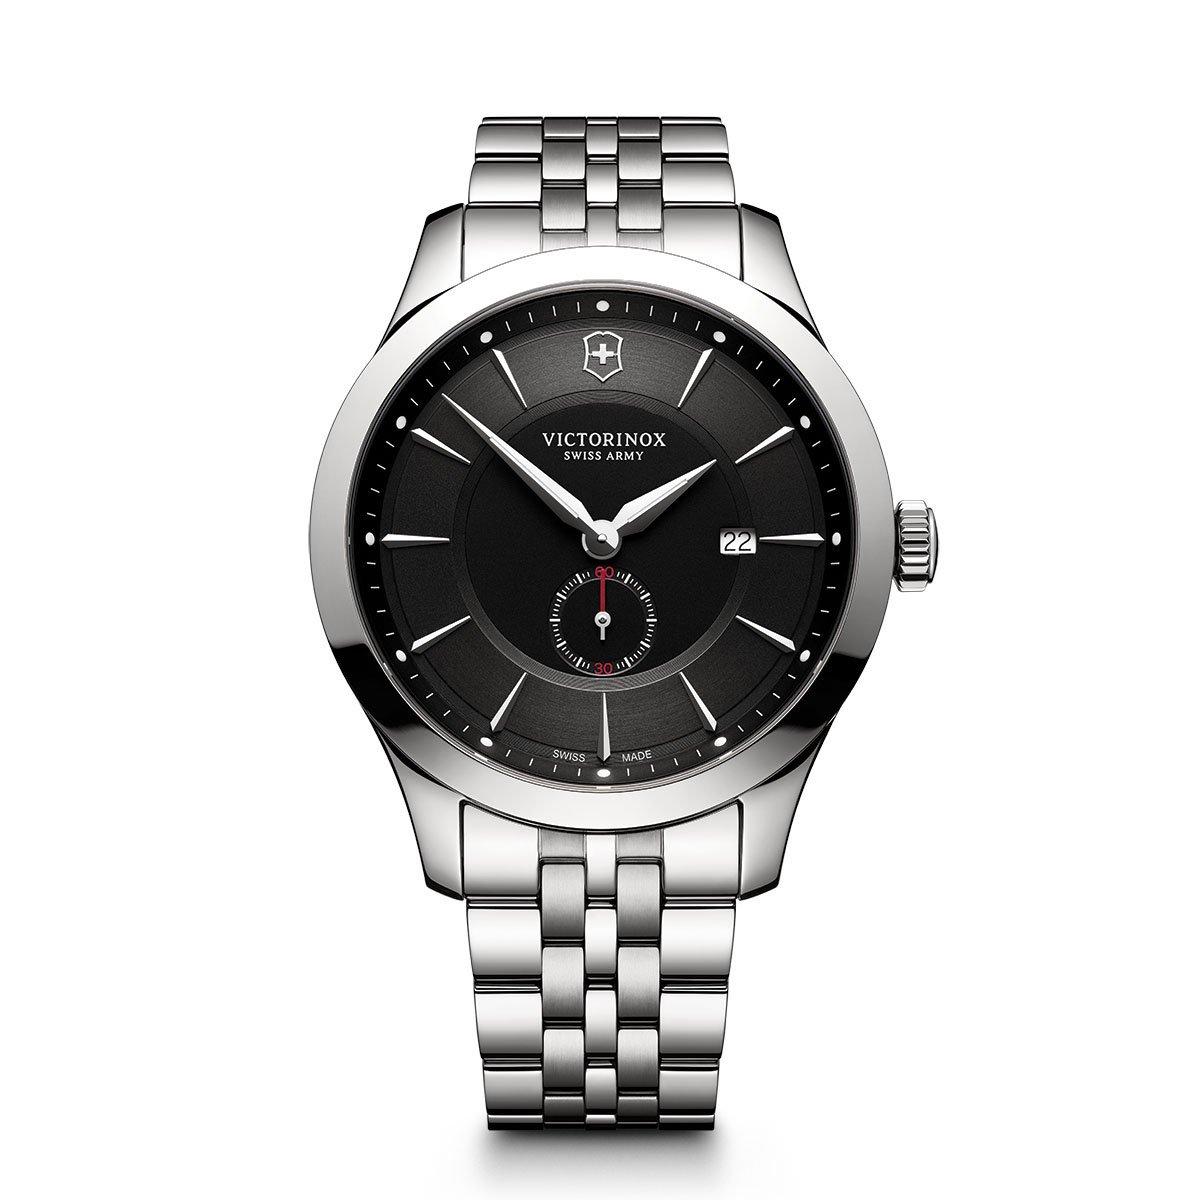 Victorinoxメンズ241711 Allianceアナログディスプレイスイスクォーツシルバー腕時計 Black Dial, Stainless Steel Bacelet B0728D52X5 Black Dial, Stainless Steel Bacelet Black Dial, Stainless Steel Bacelet